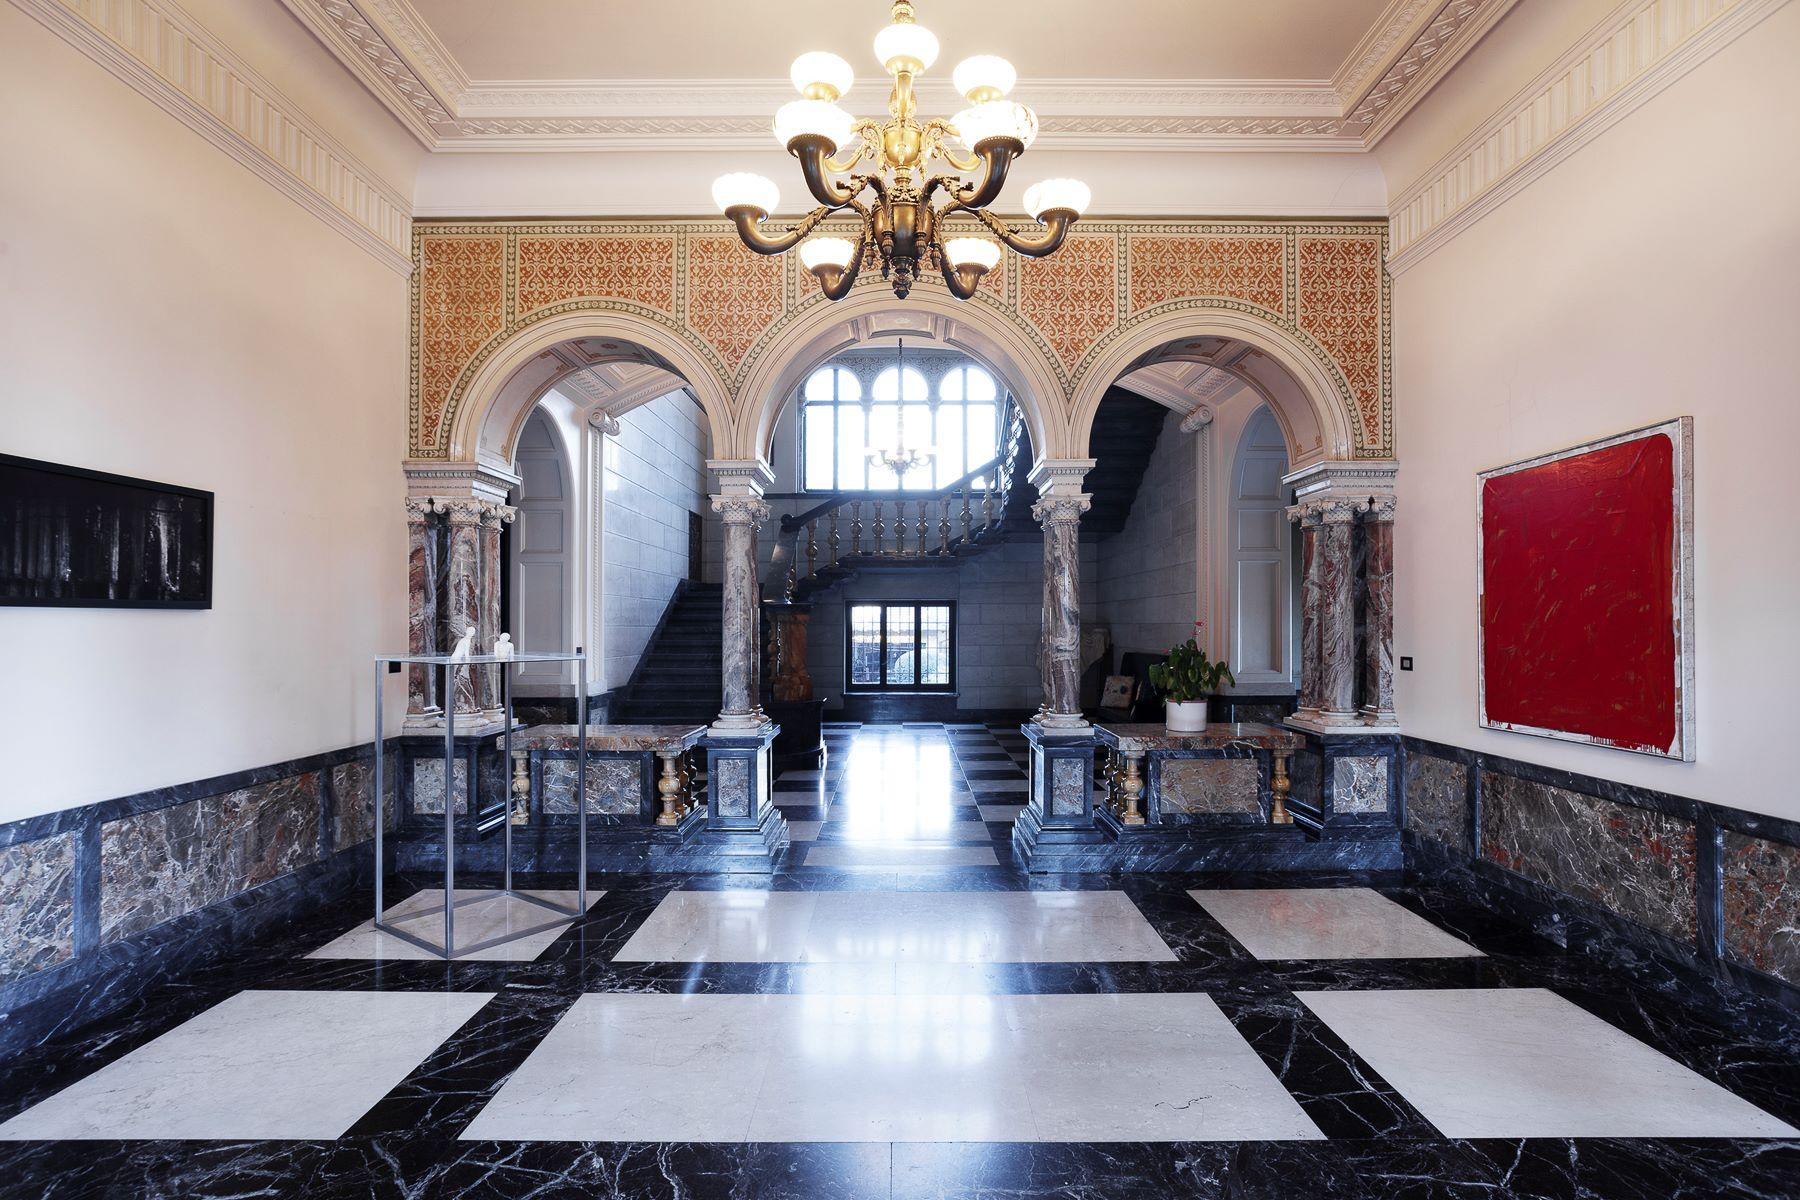 Additional photo for property listing at Beautiful Liberty Style Villa Via Galileo Galilei, 45 Biella, Biella 15900 Italia